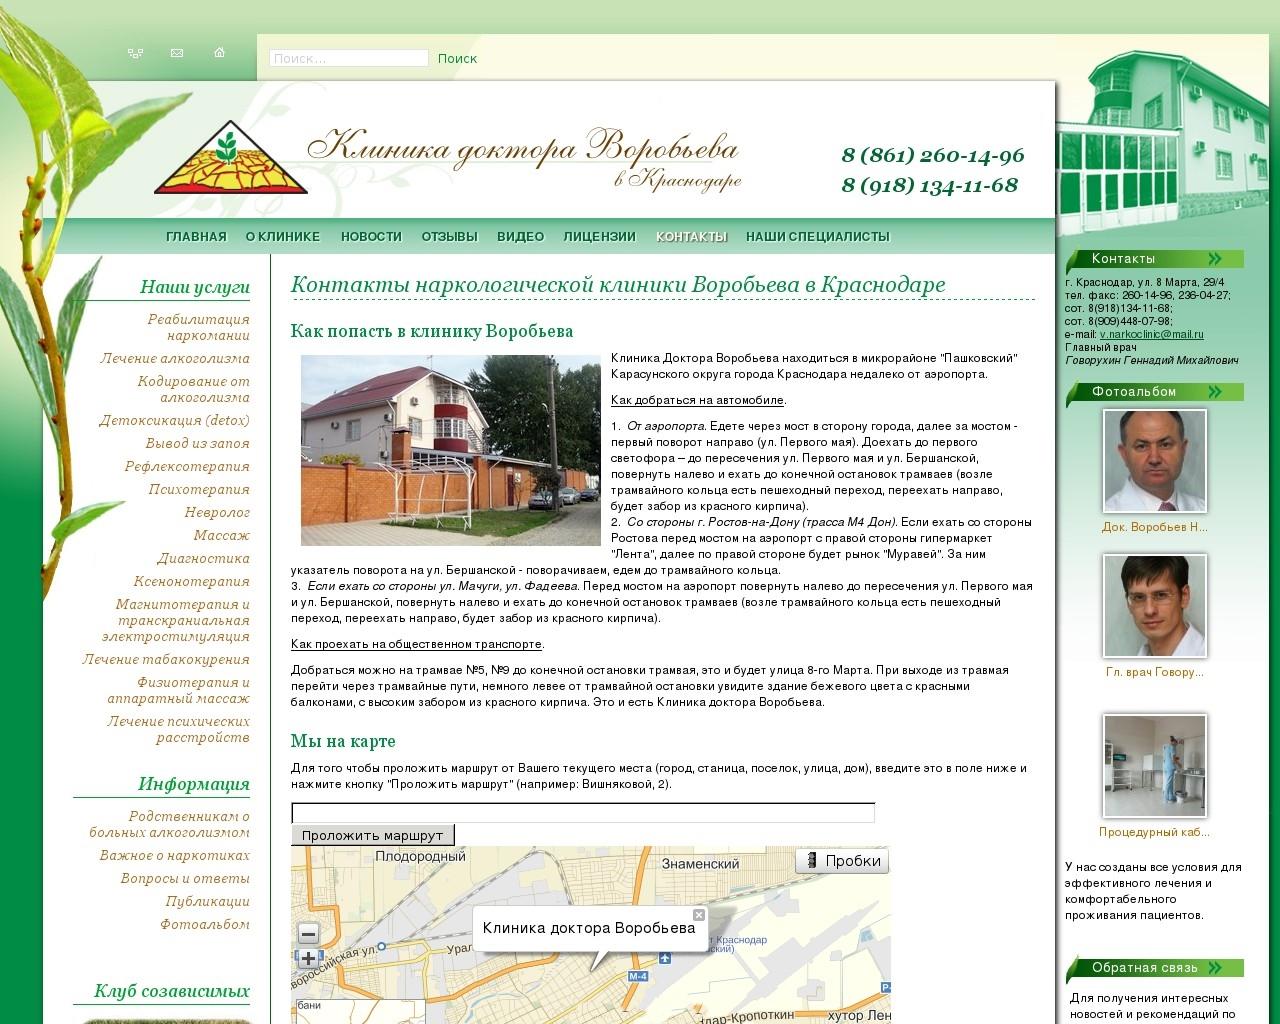 klinika-v-1280x1024-kak-proehatj